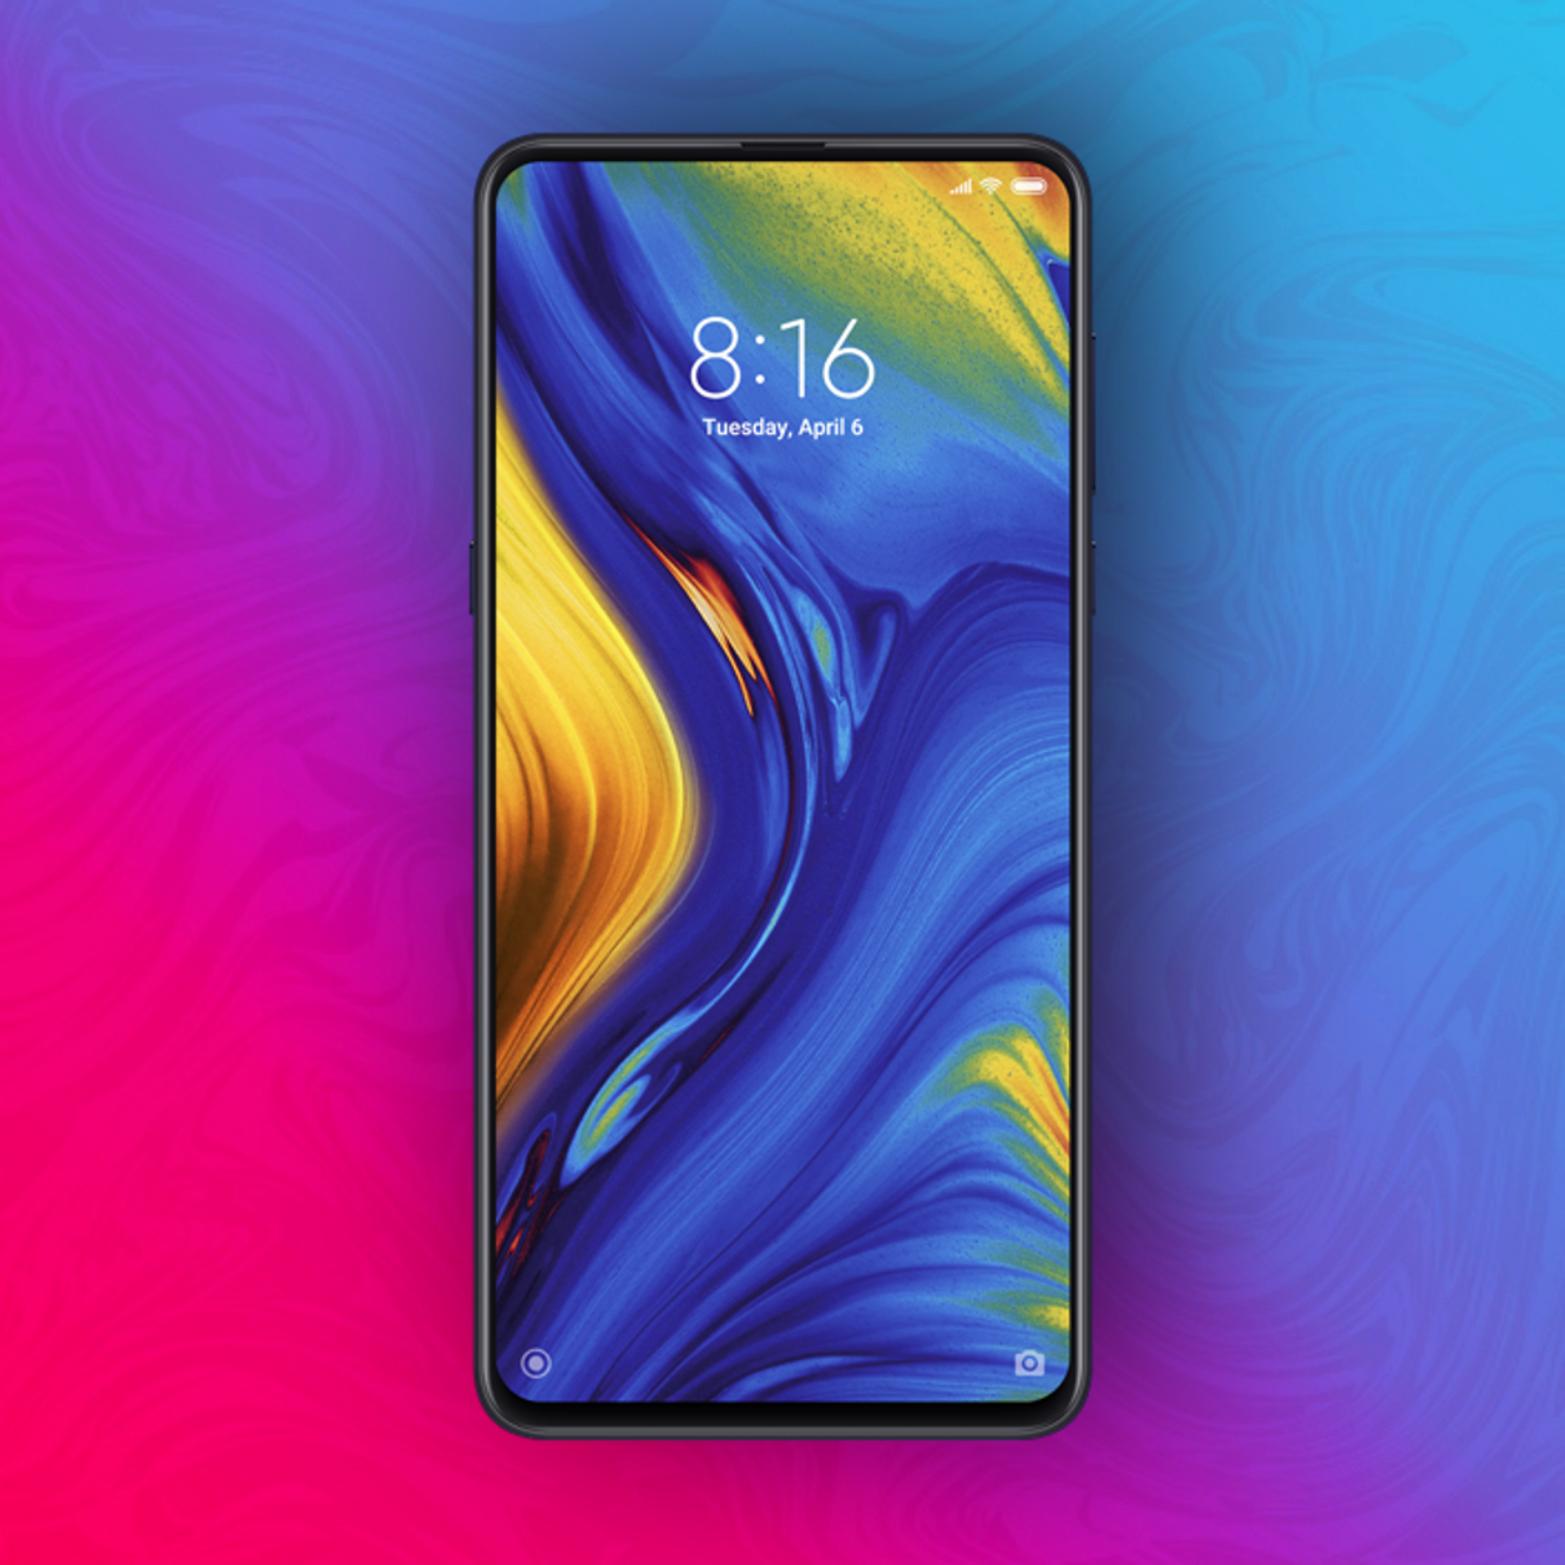 "[IT KK notwendig] Xiaomi Mi Mix 3 128/6GB - Snapdragon 845 - 6,39"" Amoled Display + Mi Powerbank 2S für 299,90€"